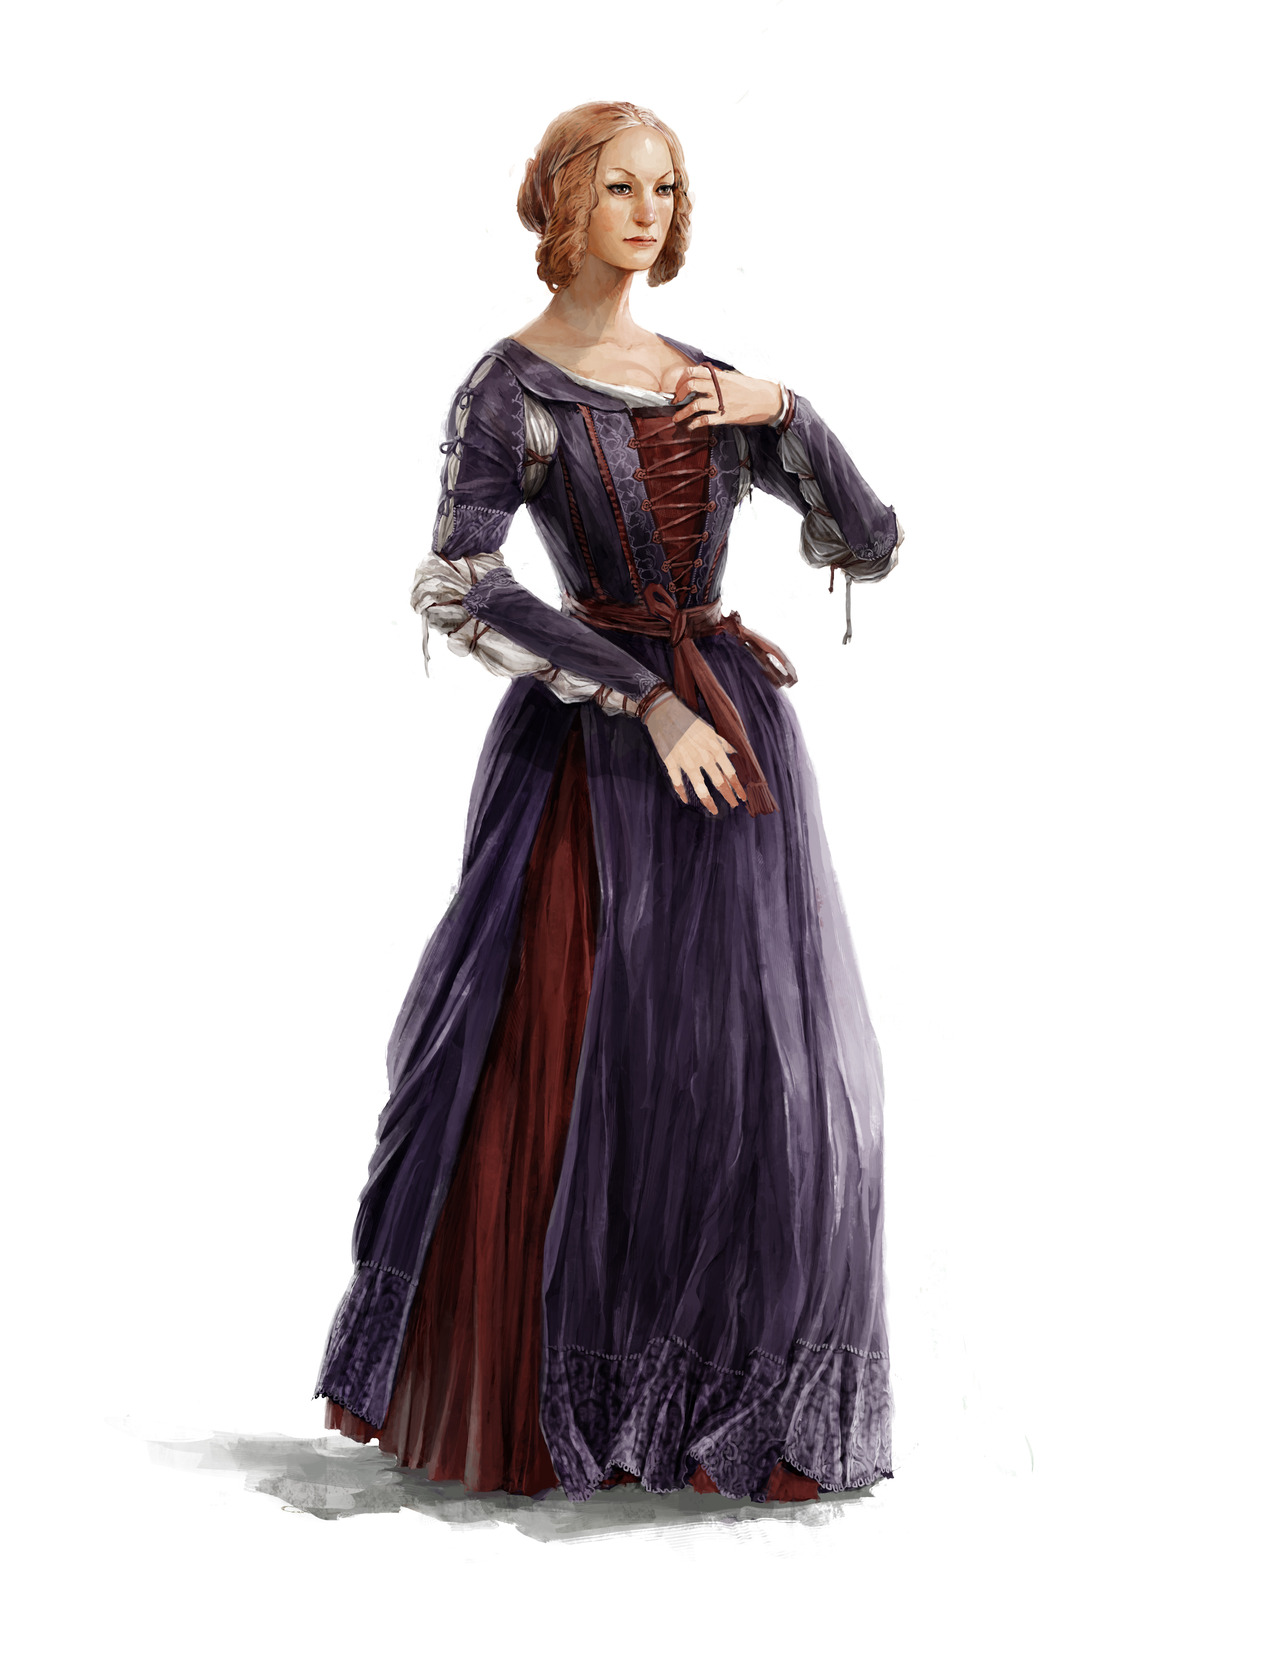 Caterina Sforza: biography 10